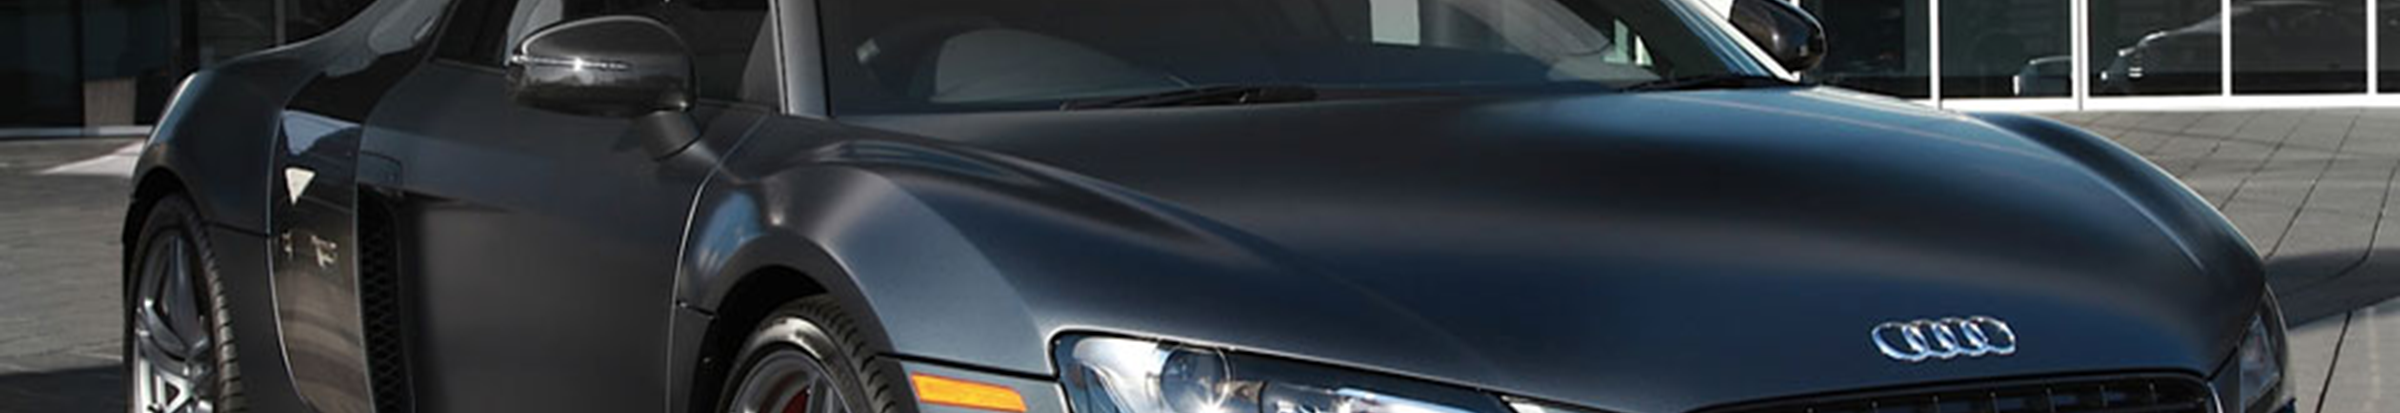 Car Paint Job Tempe Arizona Auto Body Paint Shop Phoenix